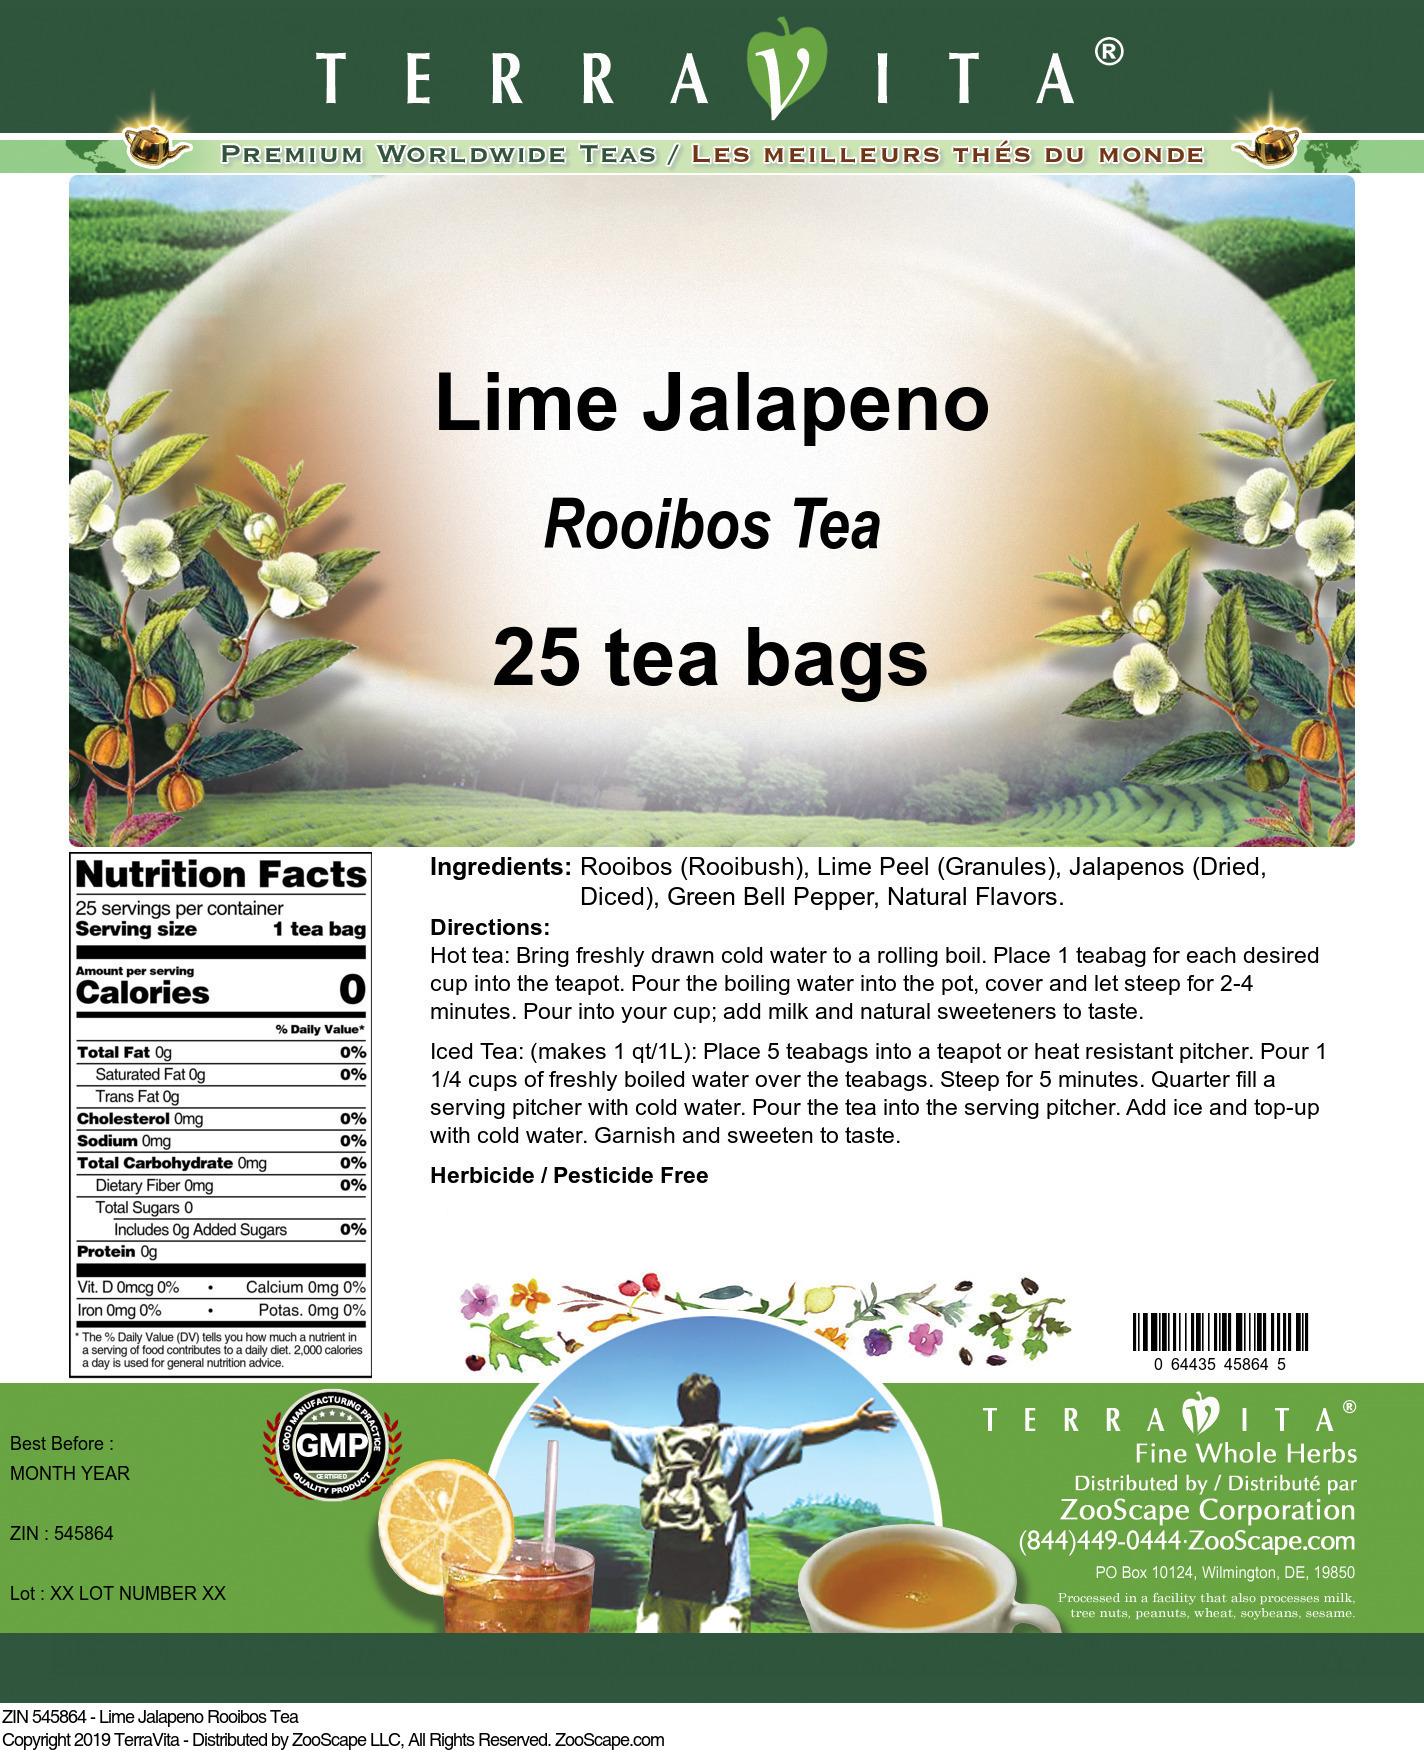 Lime Jalapeno Rooibos Tea